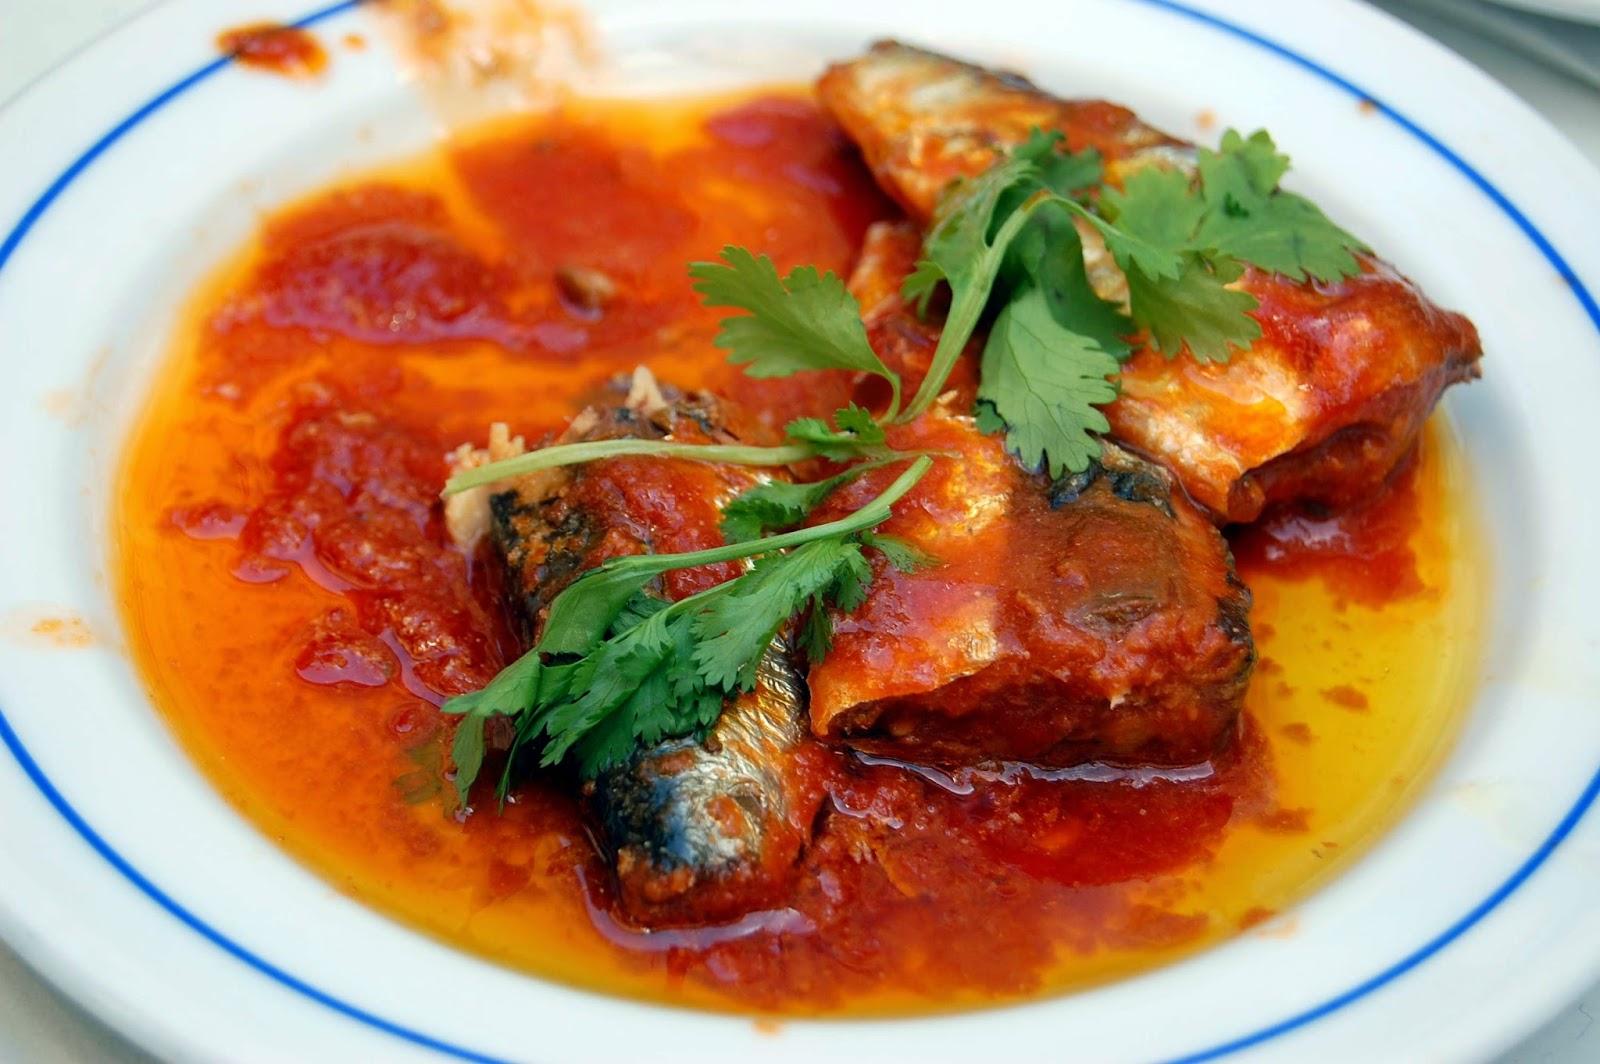 Stitch & Bear - Eat Drink Walk Petiscos Lisbon - Tinned fish tapas at Sol e Pesca